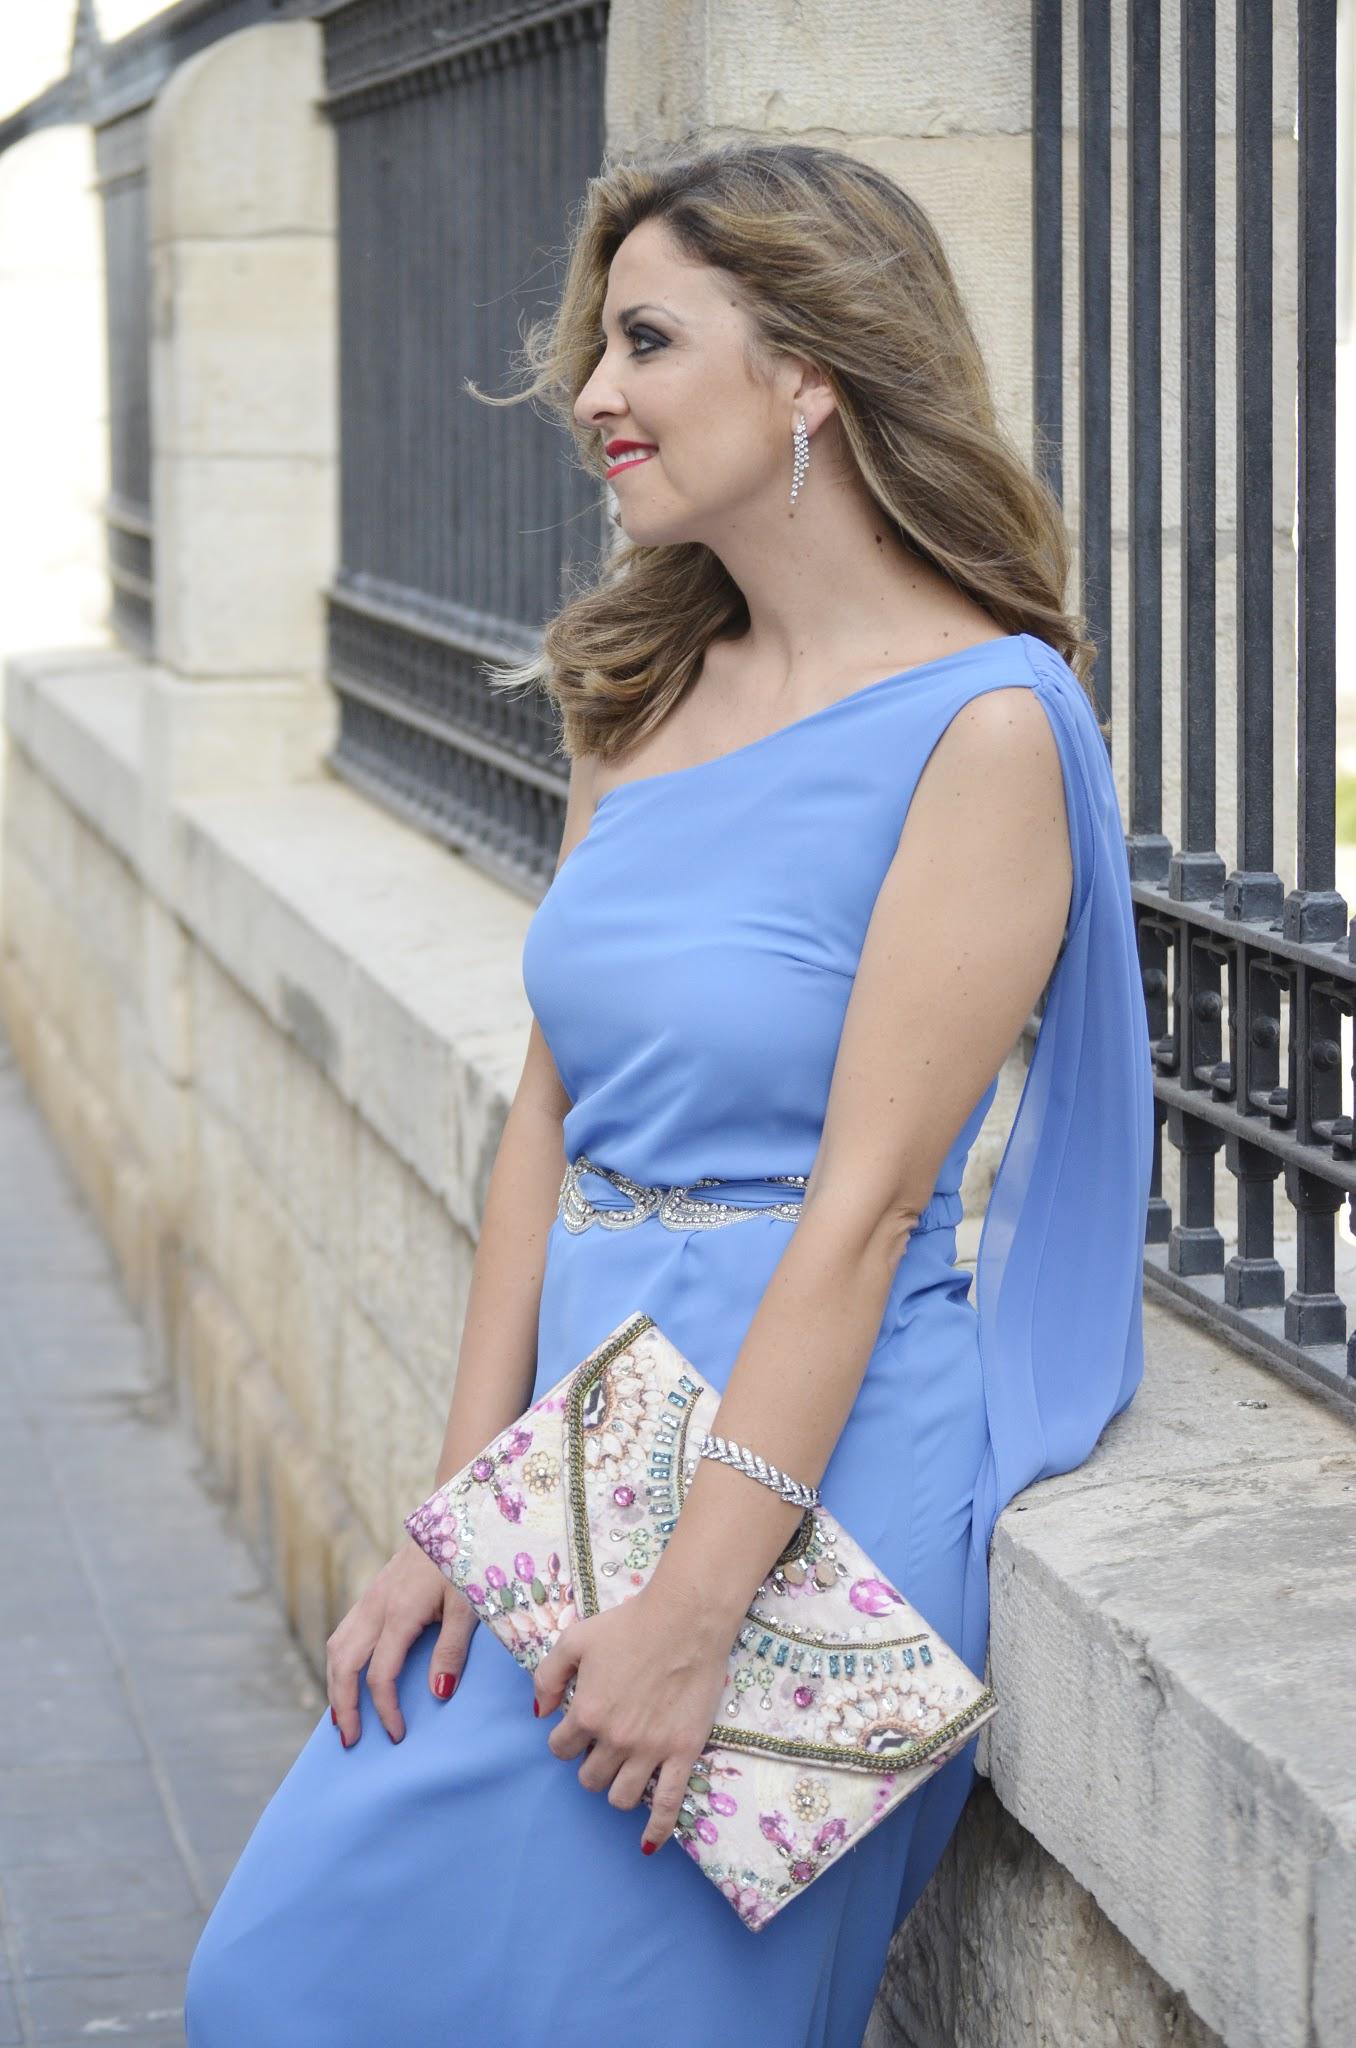 look_de_boda_la_invitada_perfecta_tarasessence